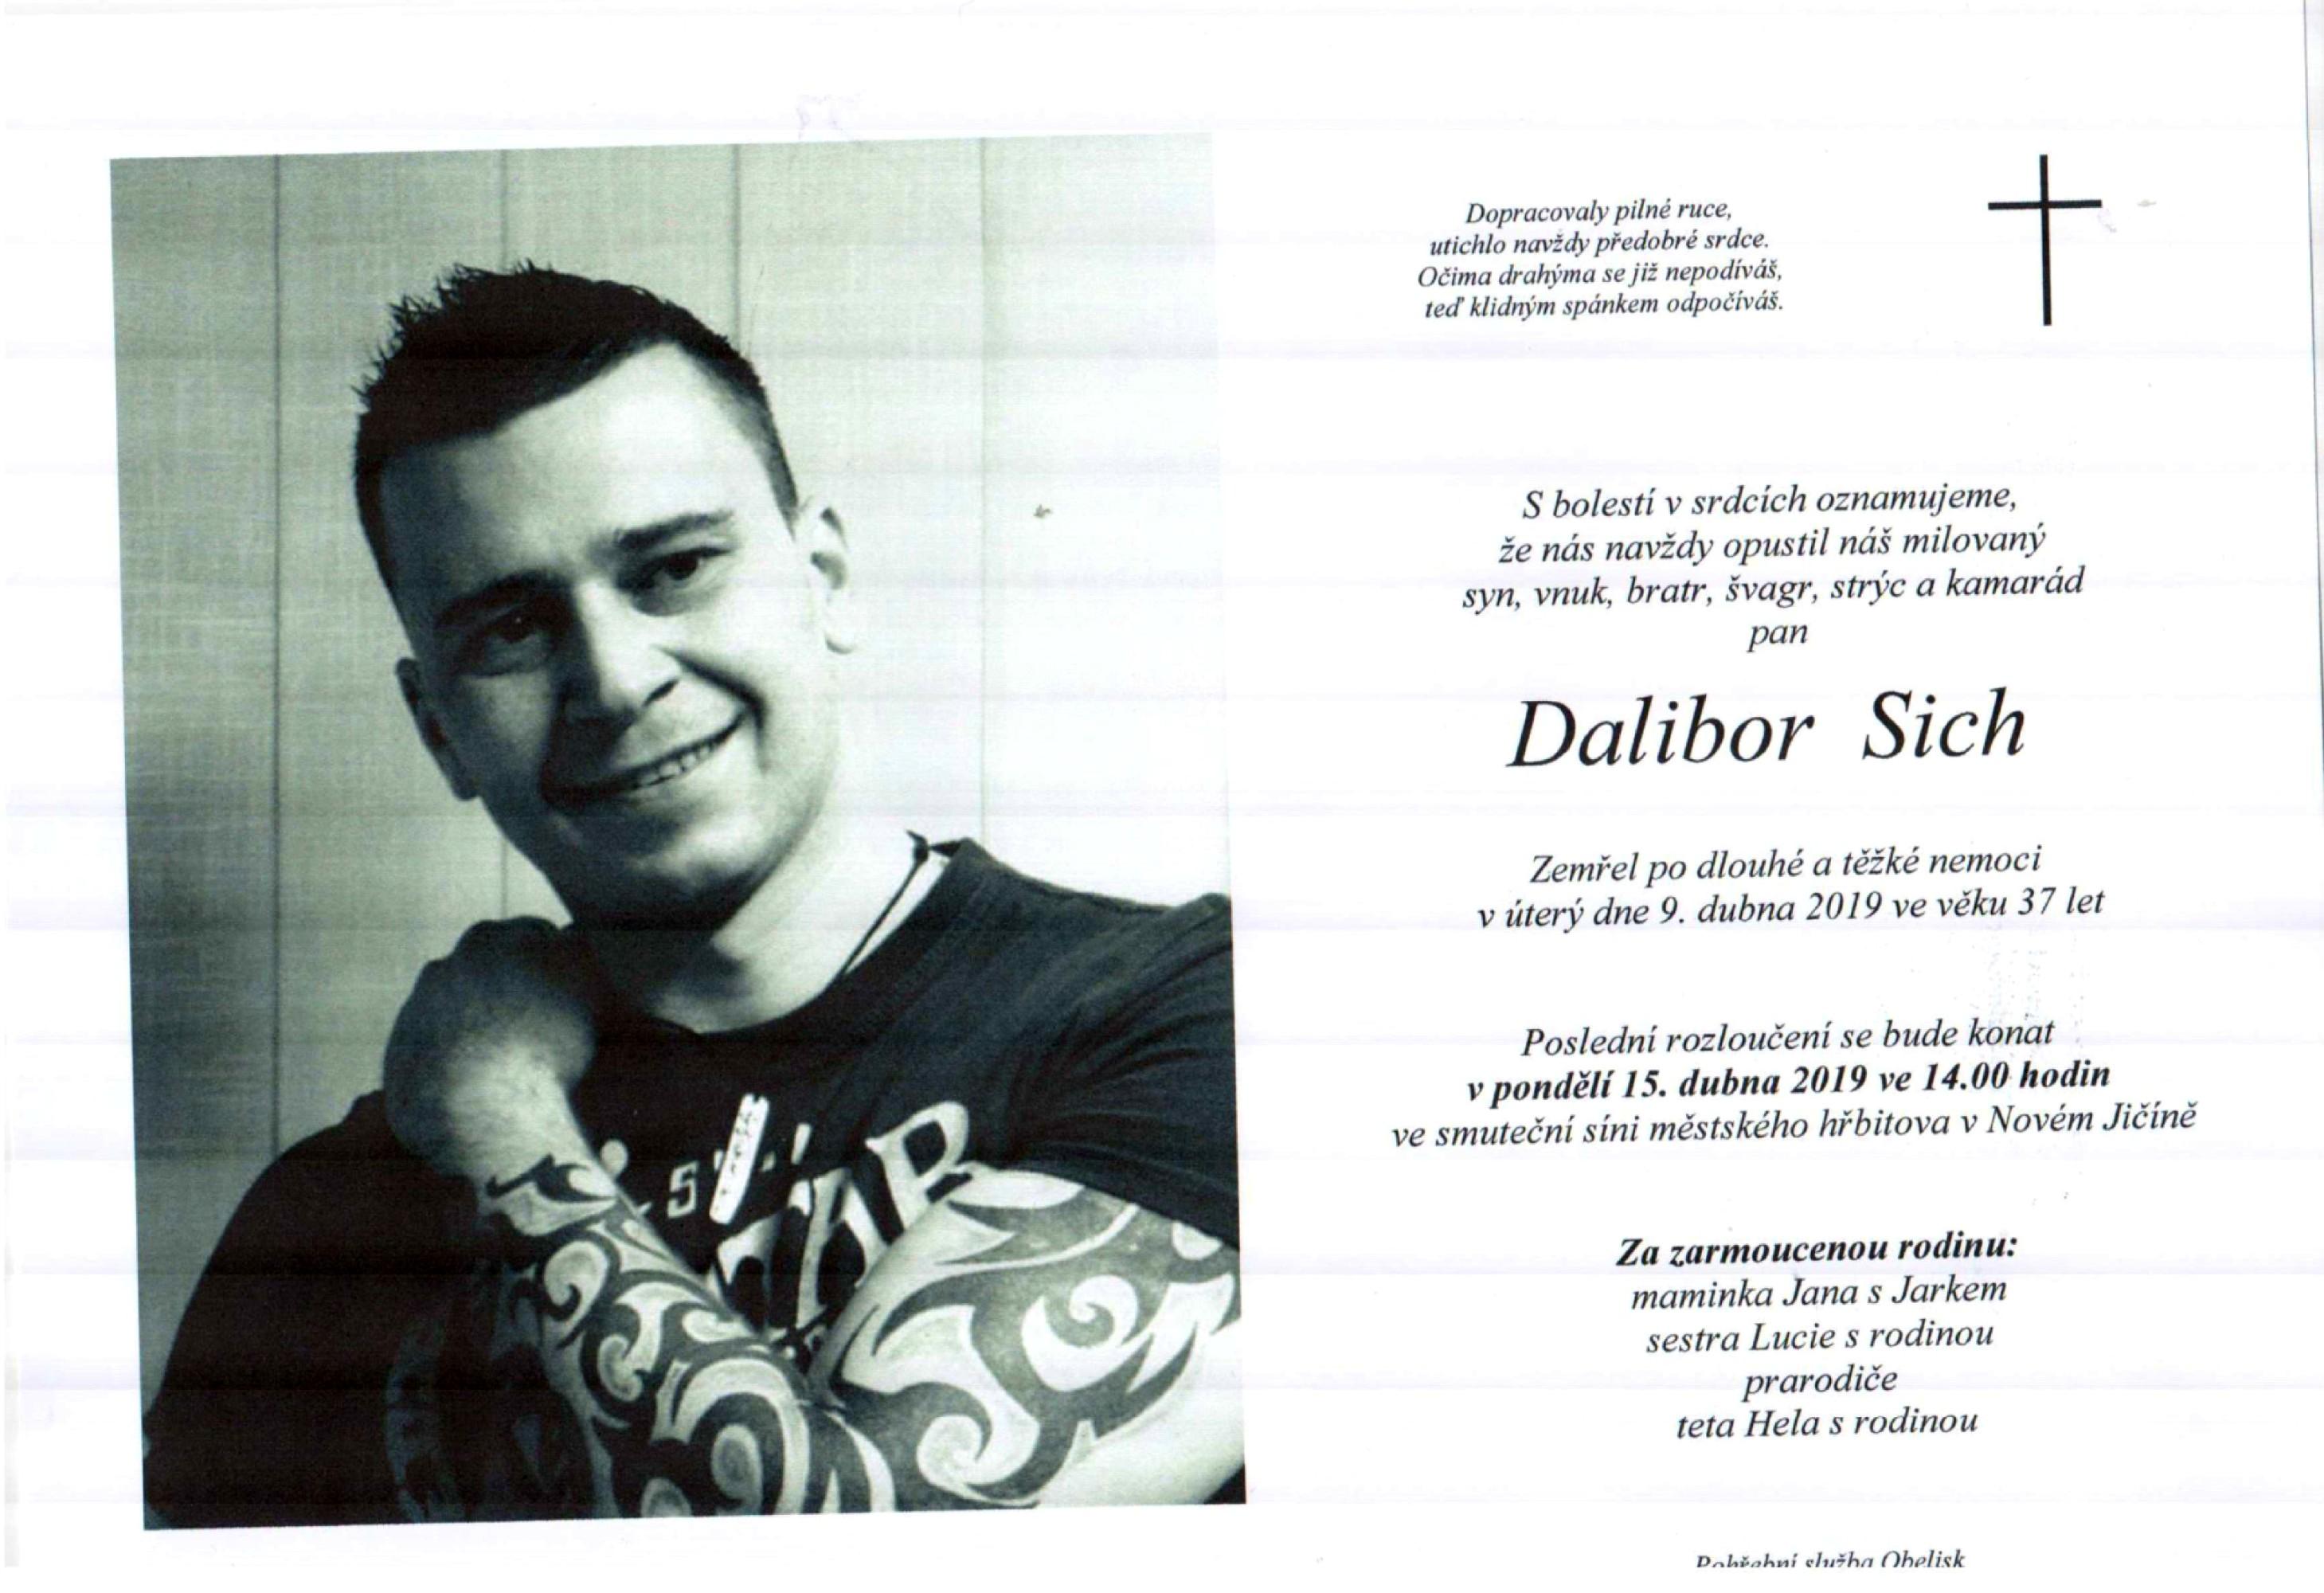 Dalibor Sich